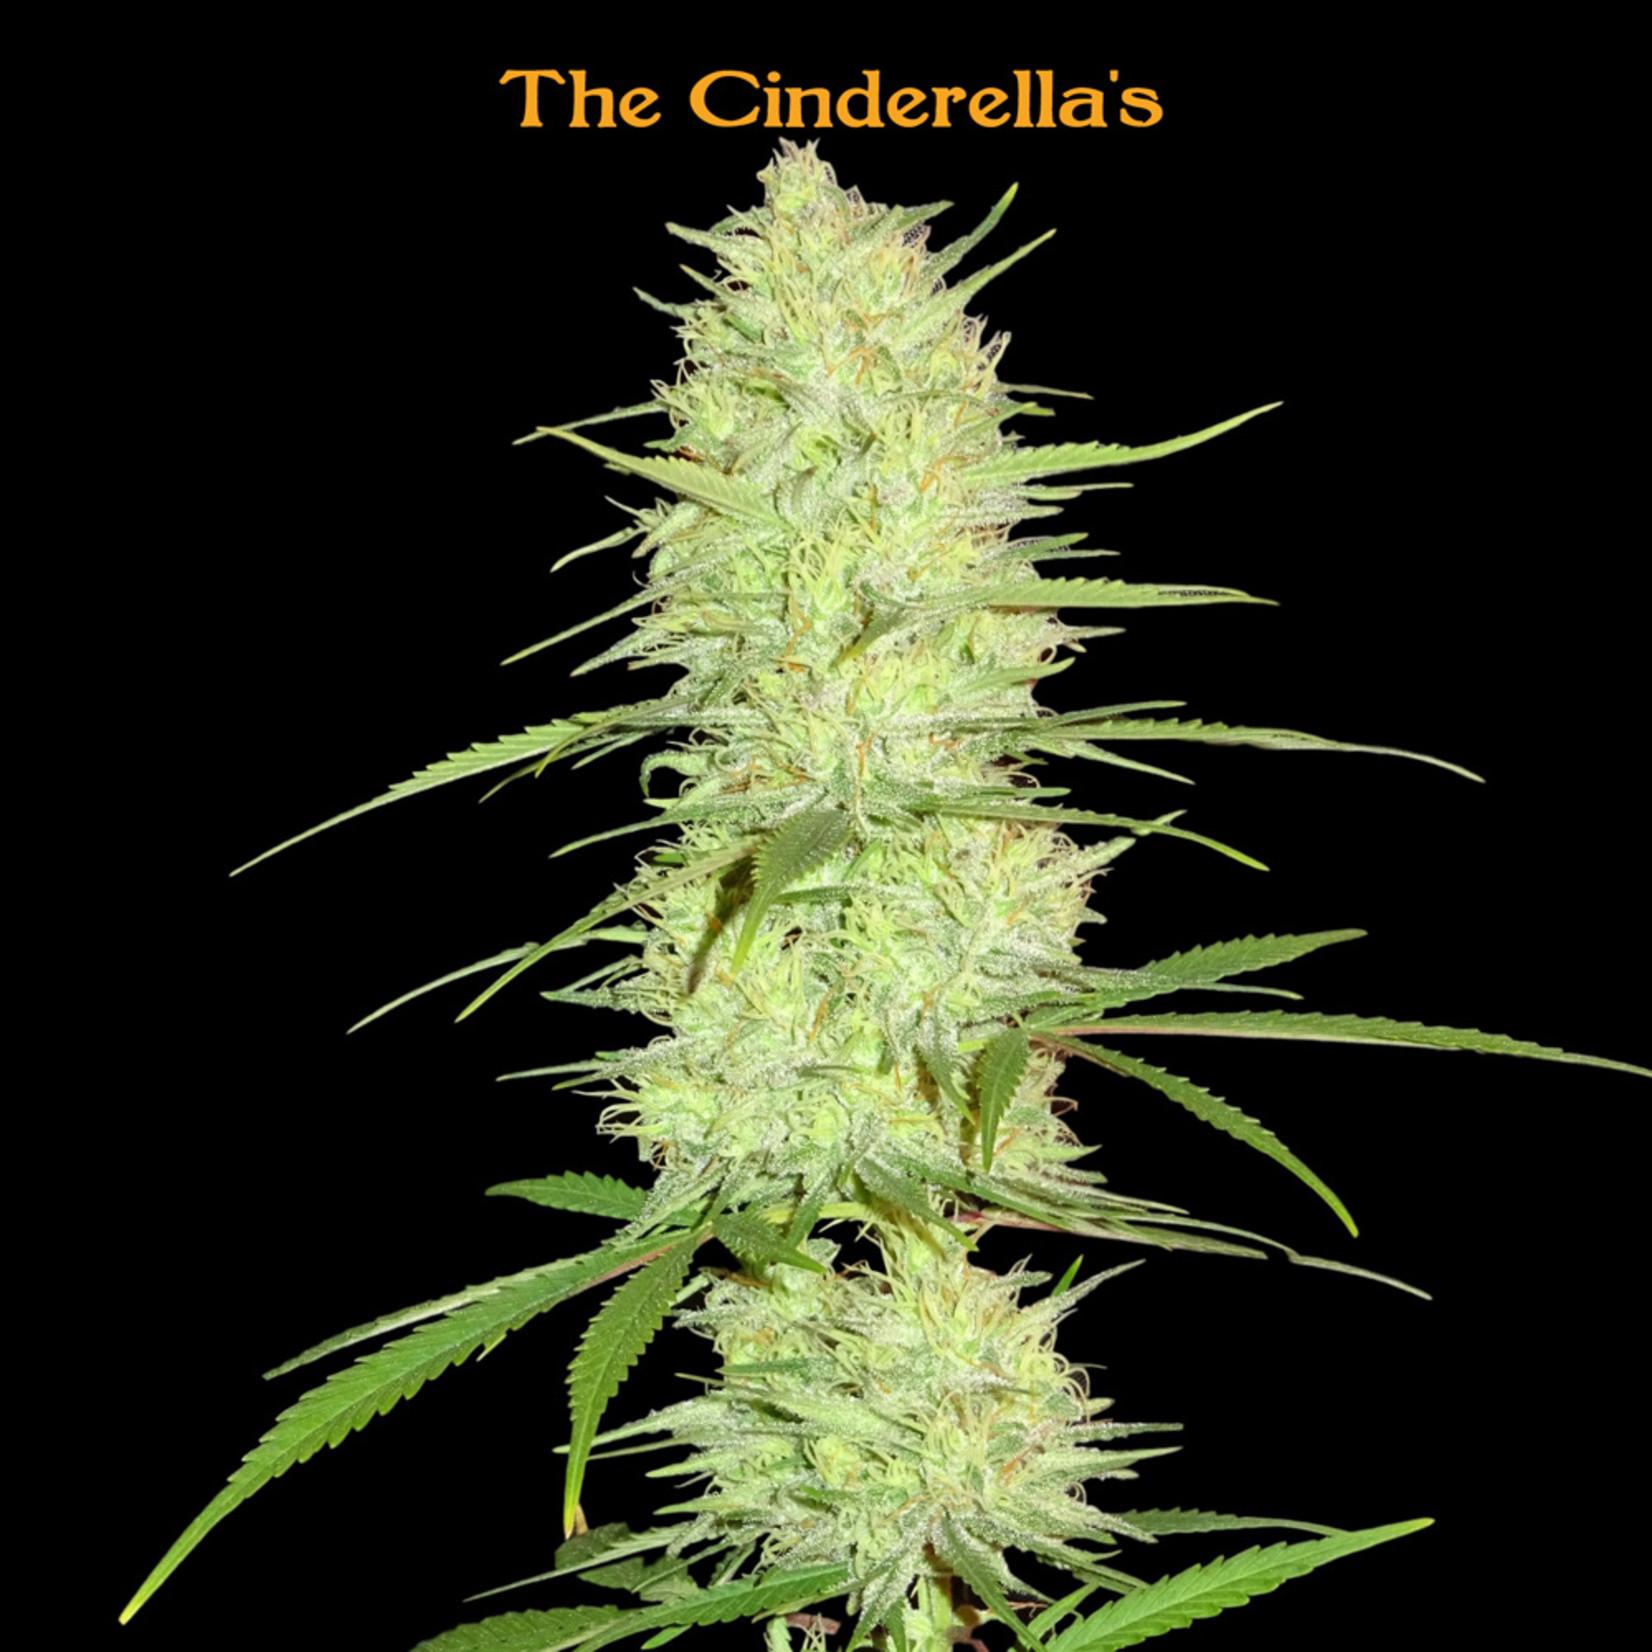 Cinderella's cannabis seeds